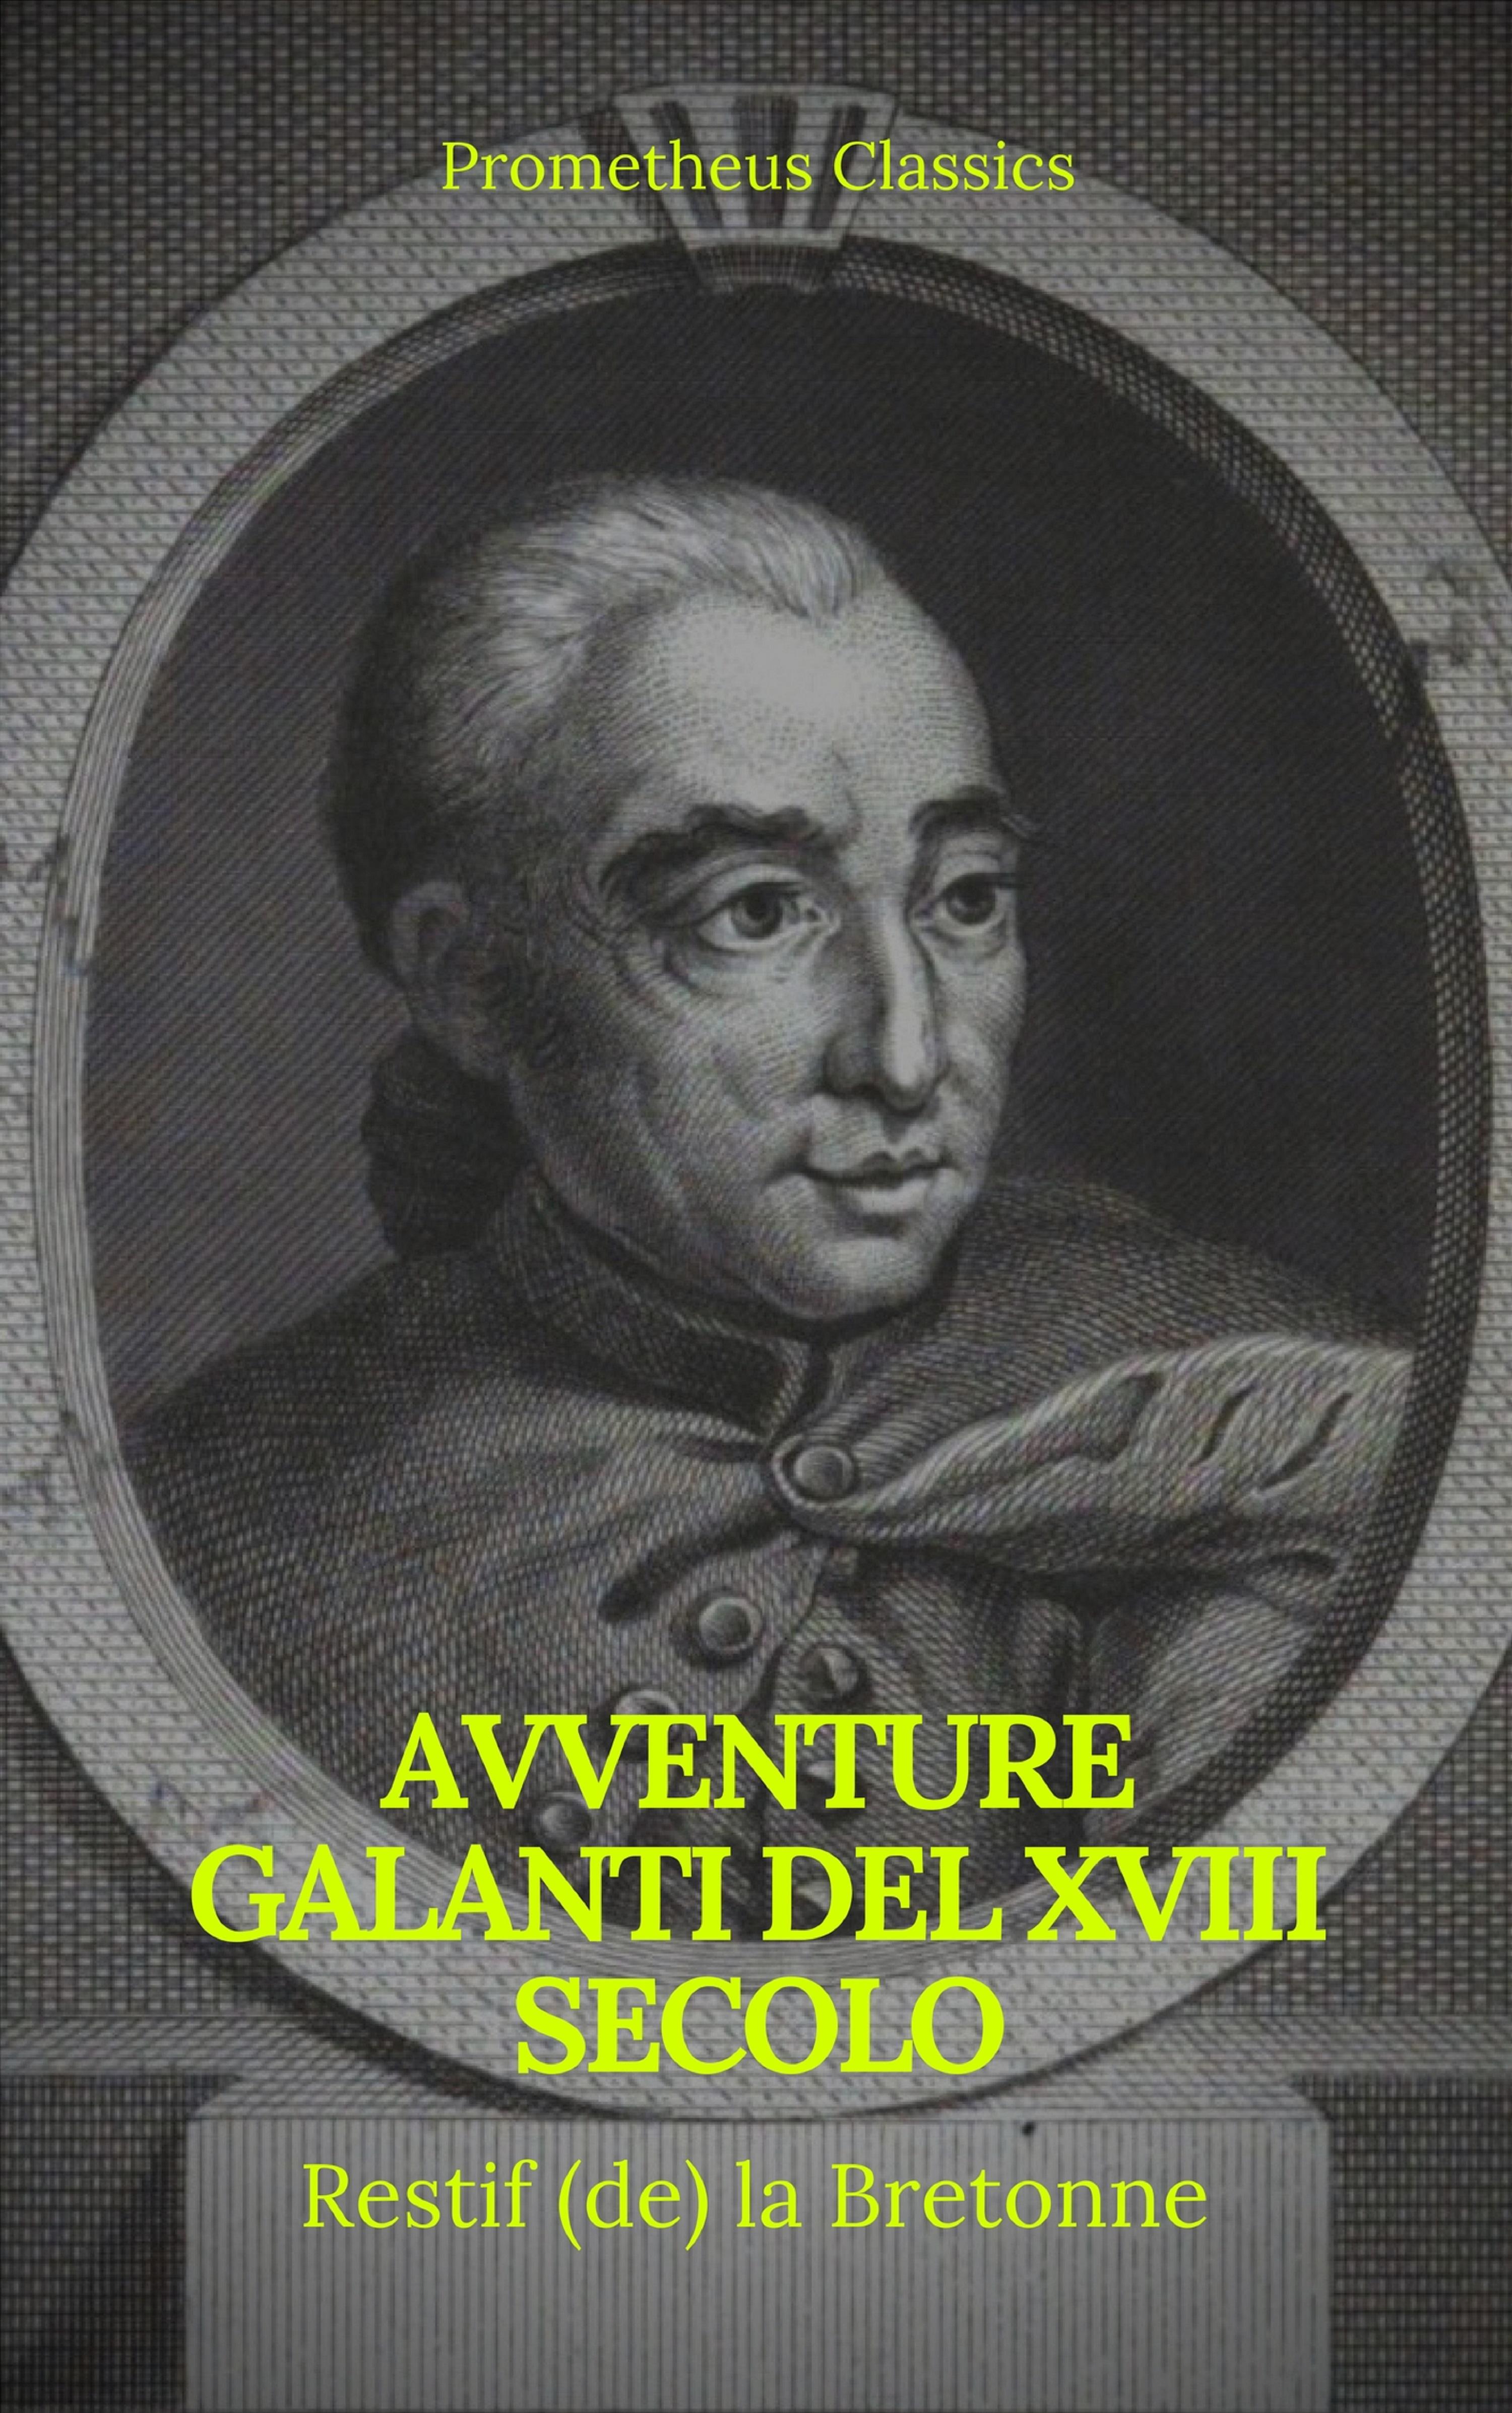 цена Prometheus Classics Avventure galanti del XVIII secolo (Indice attivo) онлайн в 2017 году